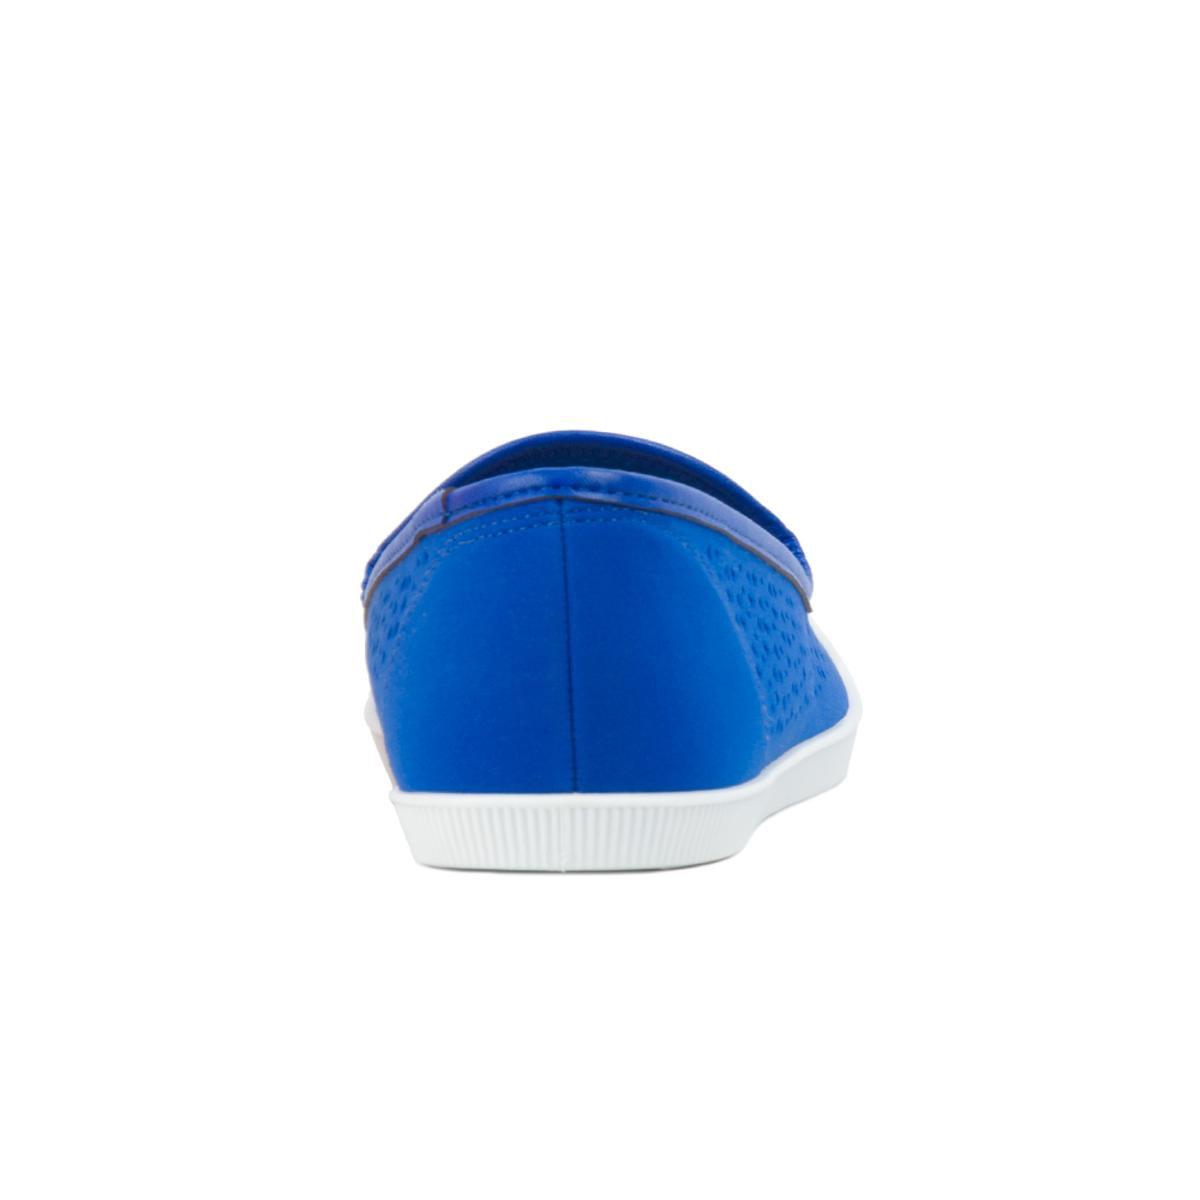 Azul Tênis Slipper Vazado Moleca Tênis Moleca qZrwXfvpZ